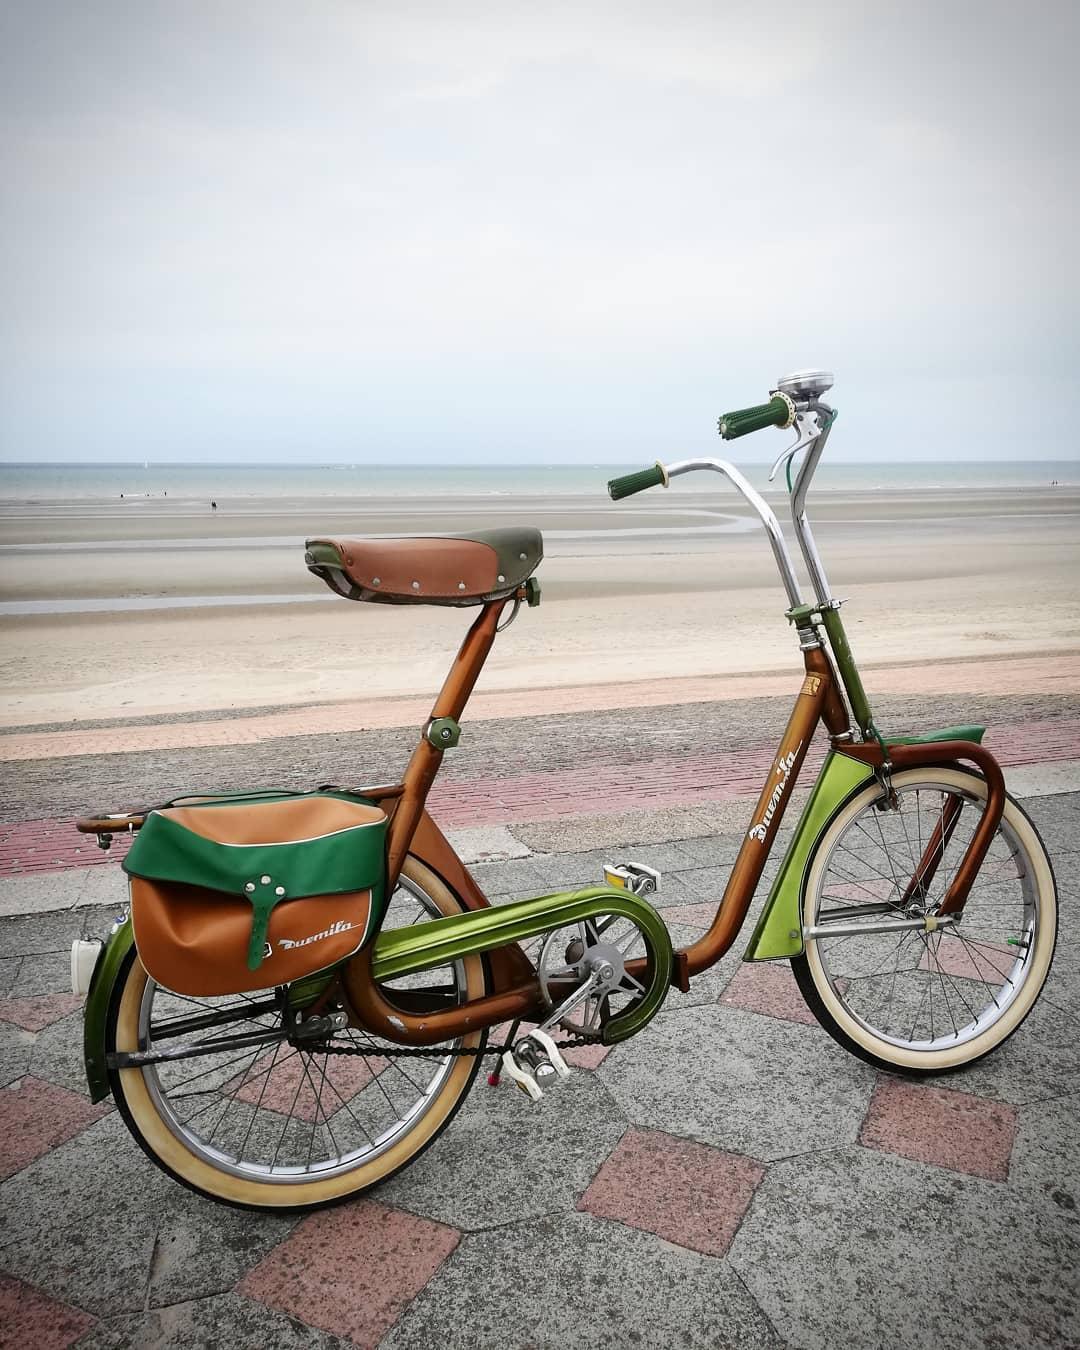 Duemila Klapprad/Faltrad von 1965